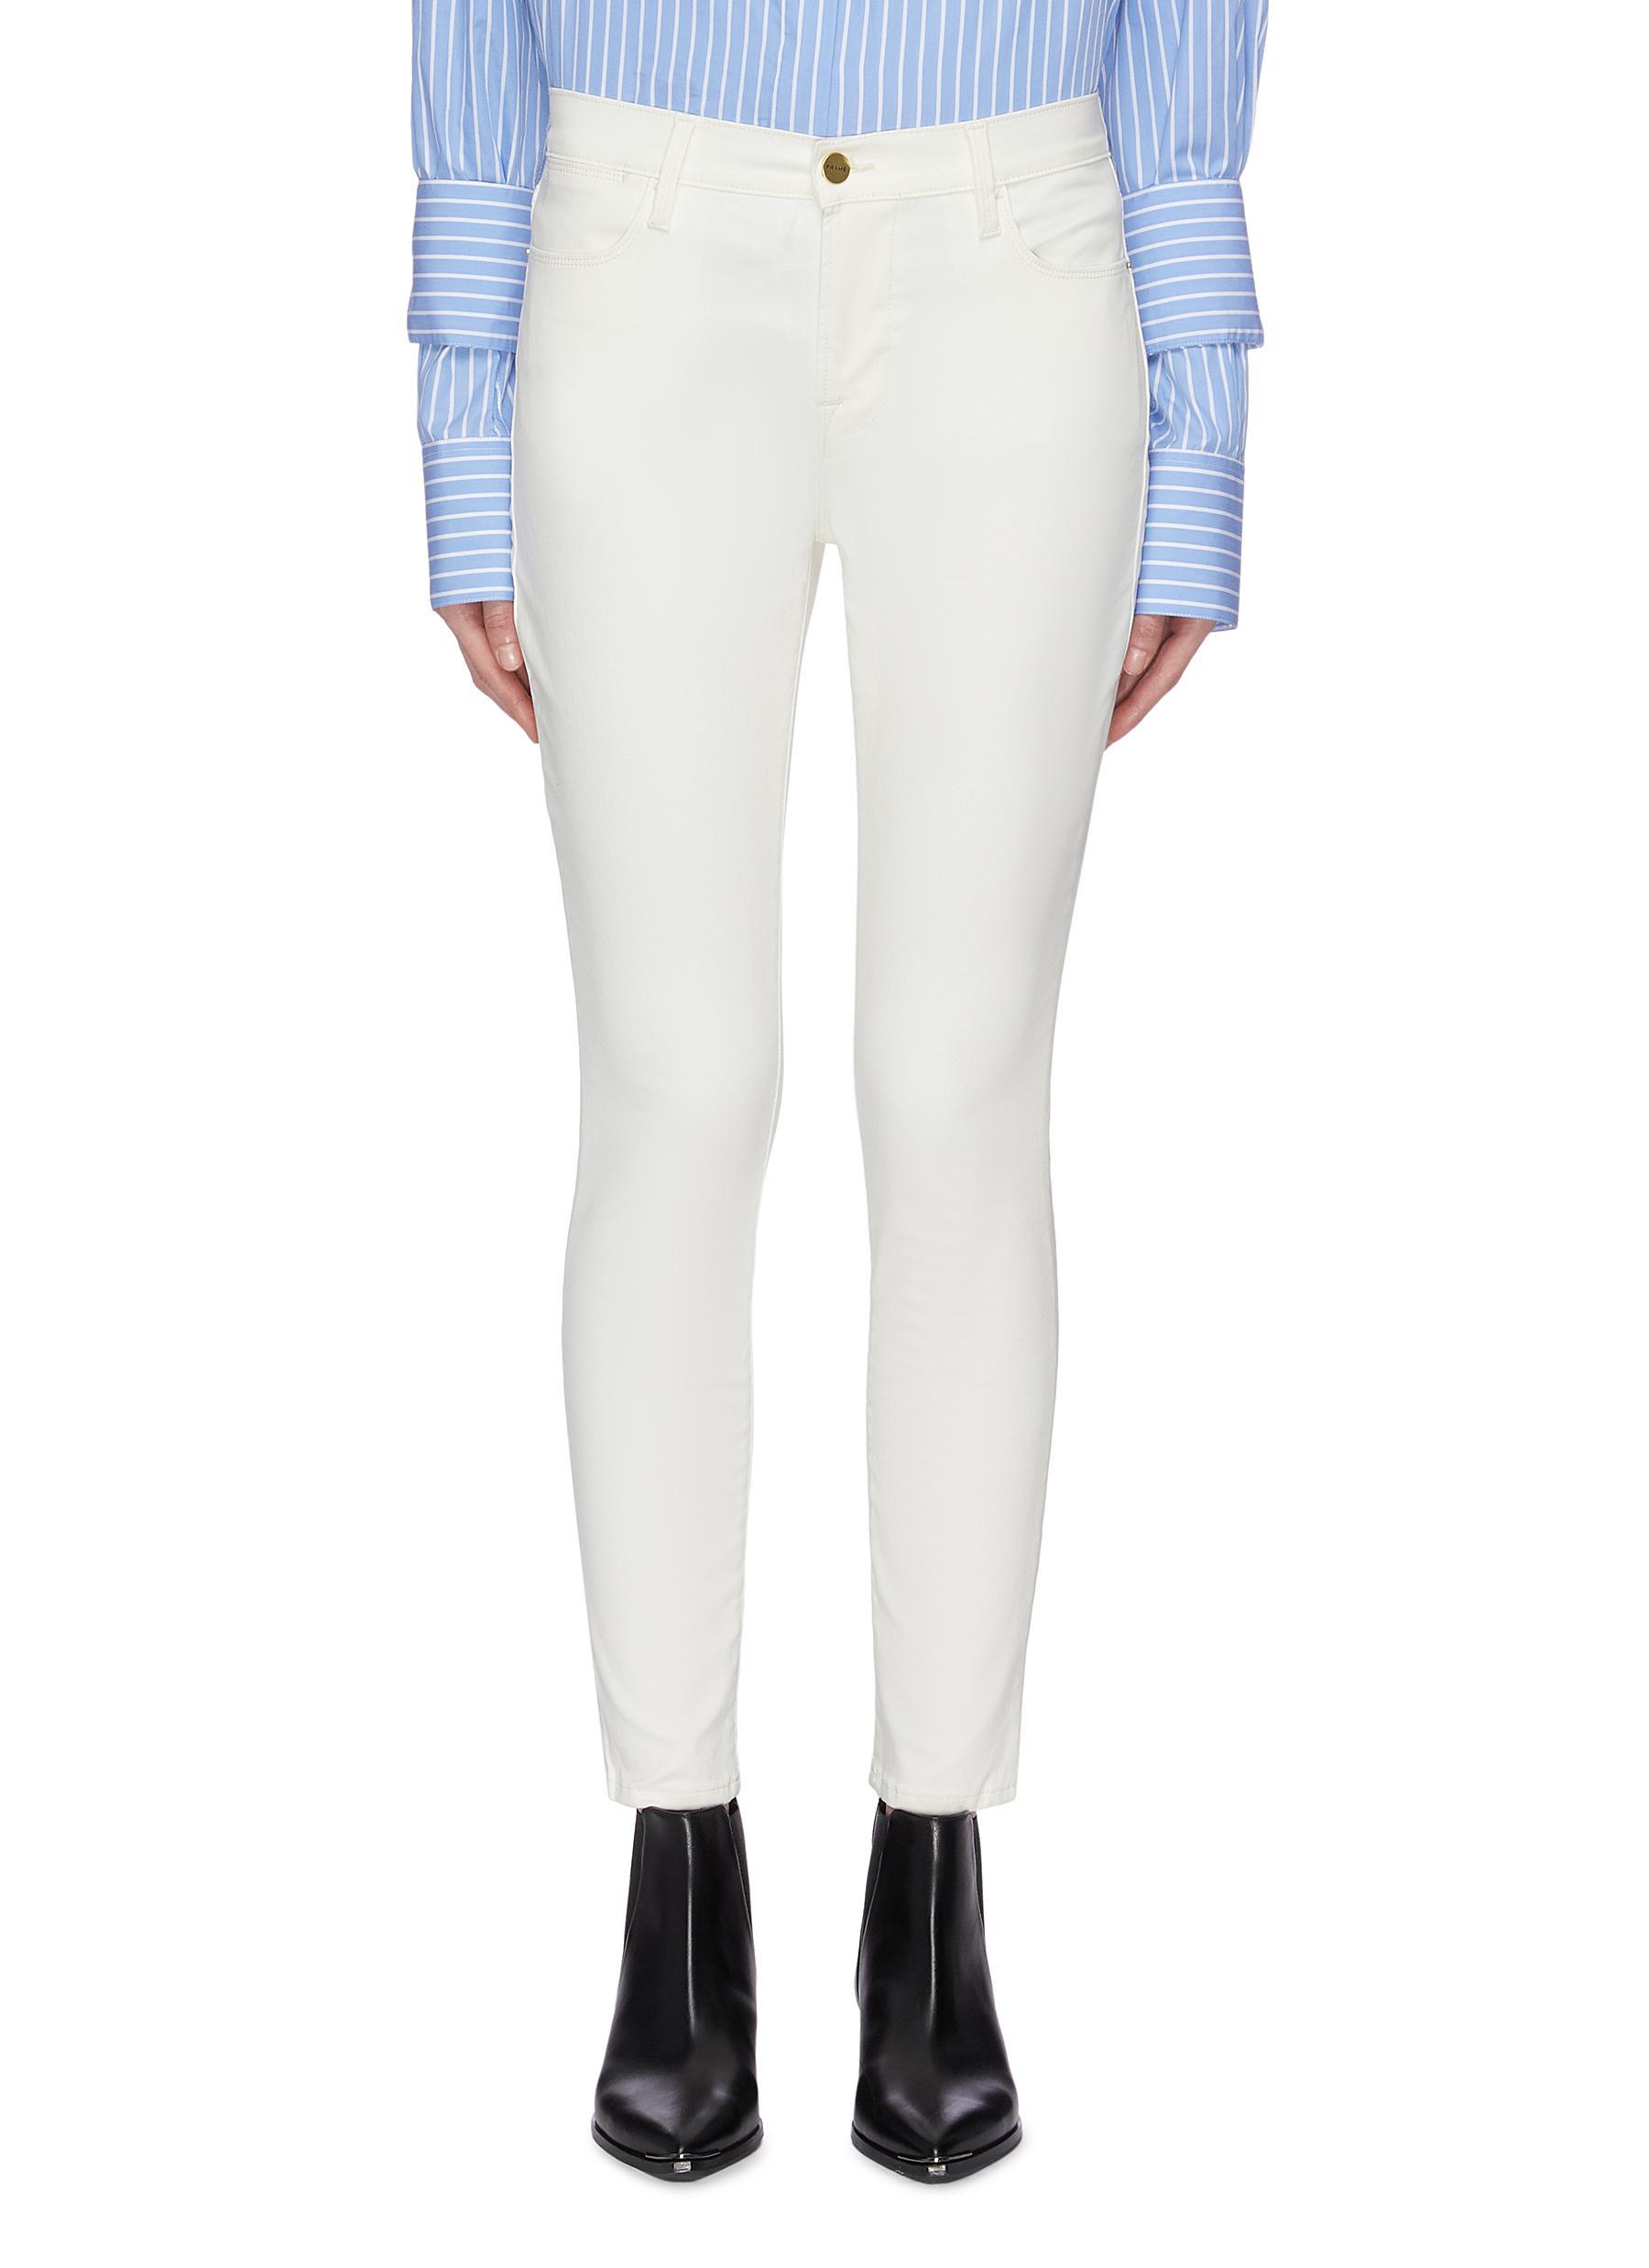 Le High Skinny jeans by Frame Denim